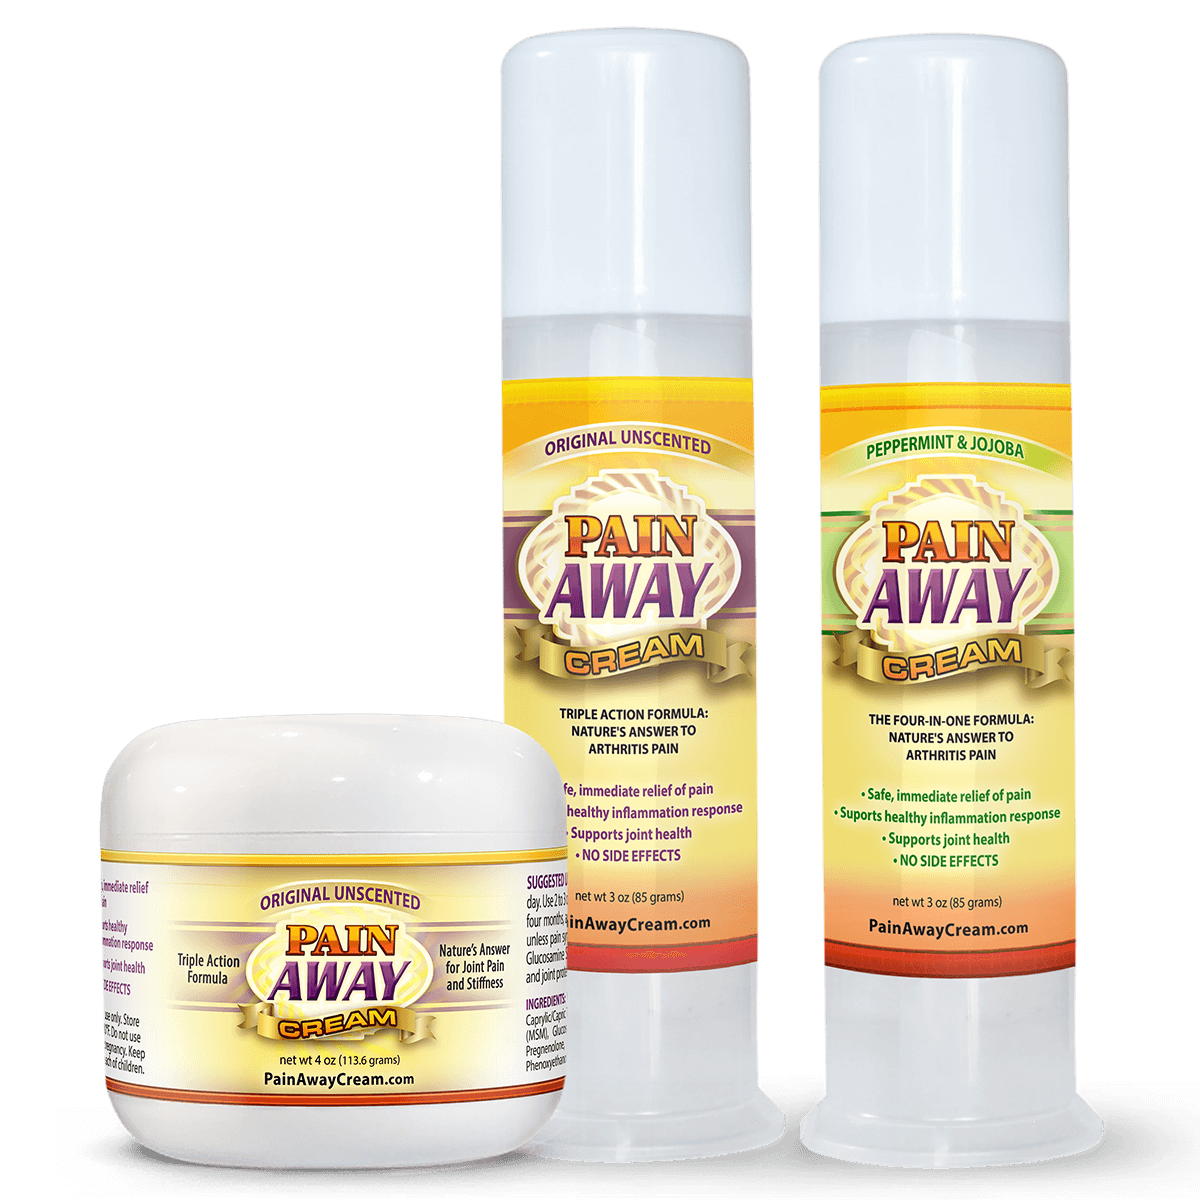 10 Best CBD Creams for Arthritis Pain & Inflammation - Reviews - [2020]